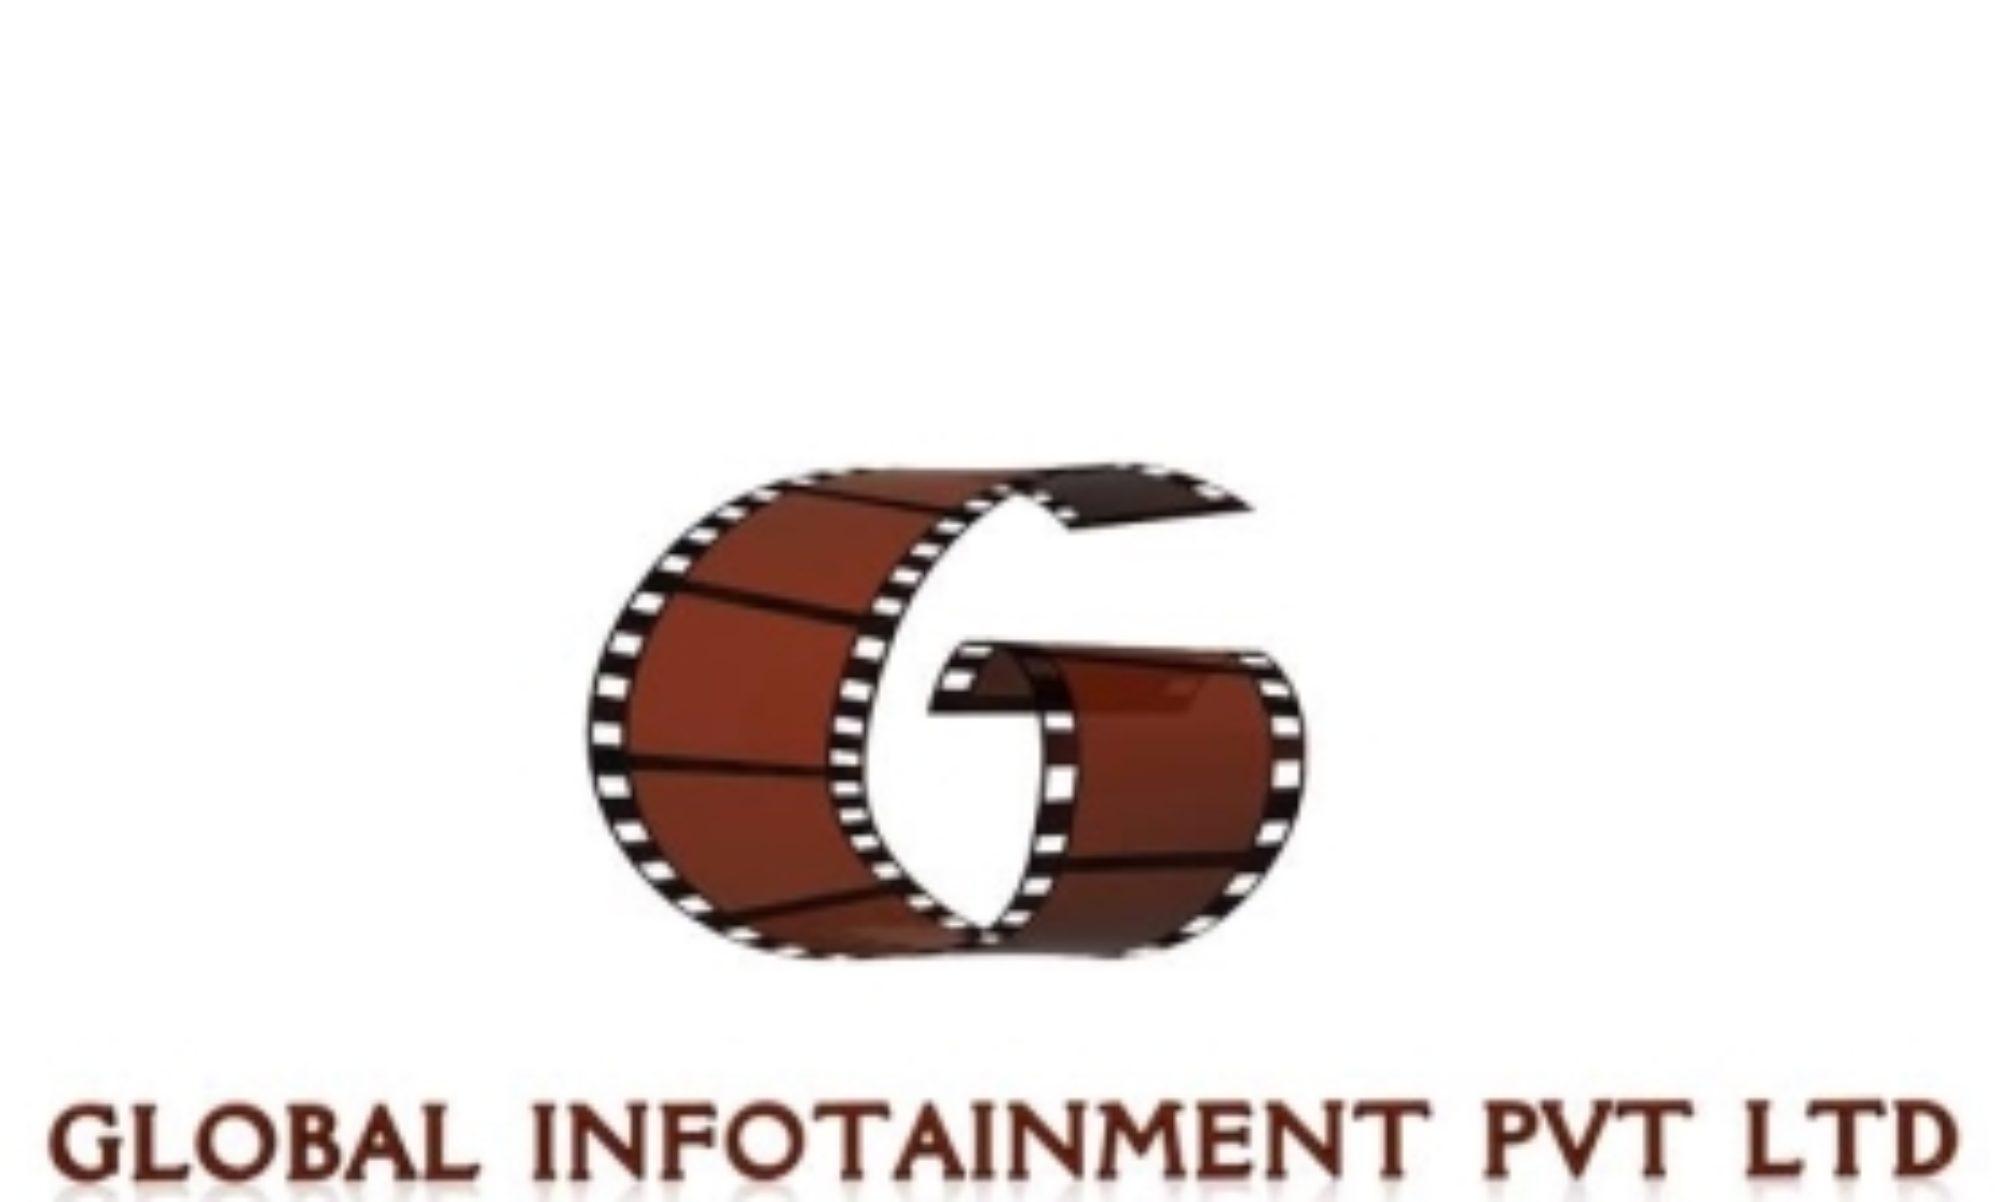 Global Infotainment Pvt Ltd